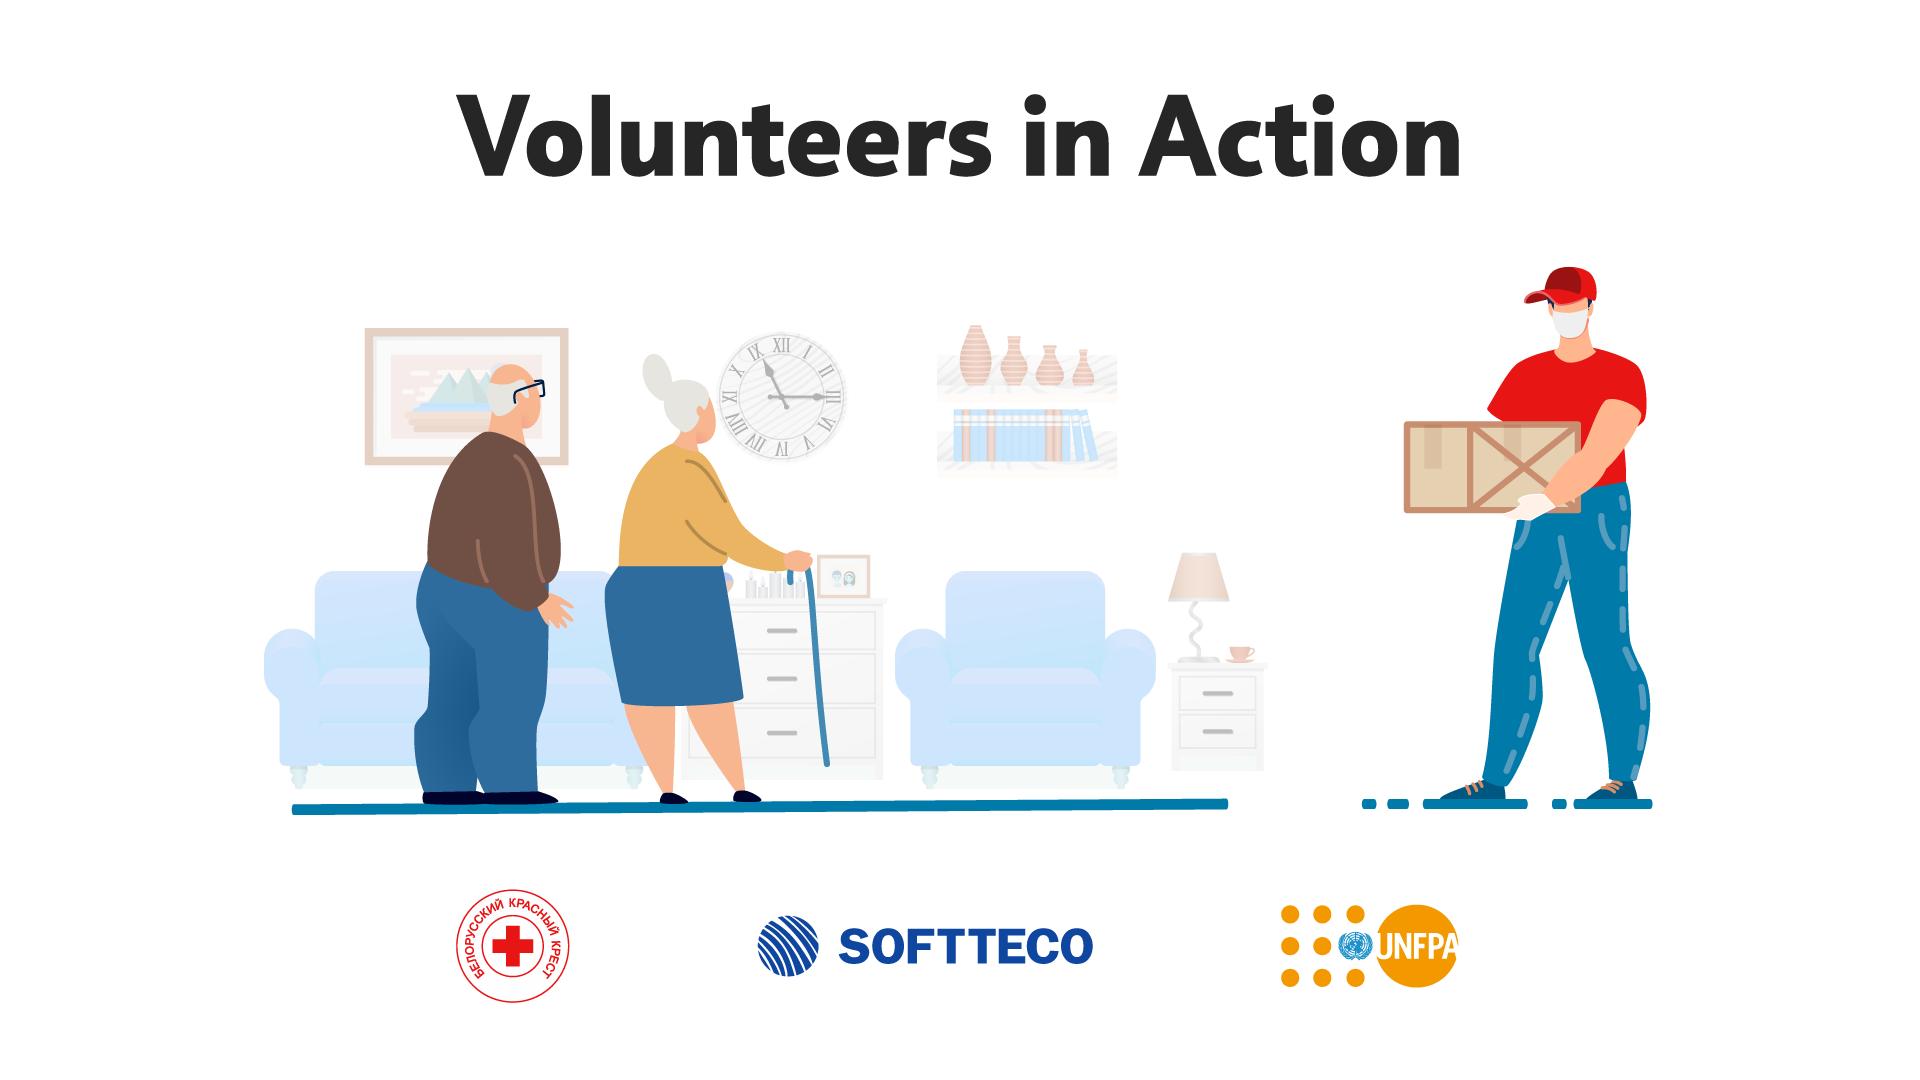 UNFPA Volunteers-in-Action